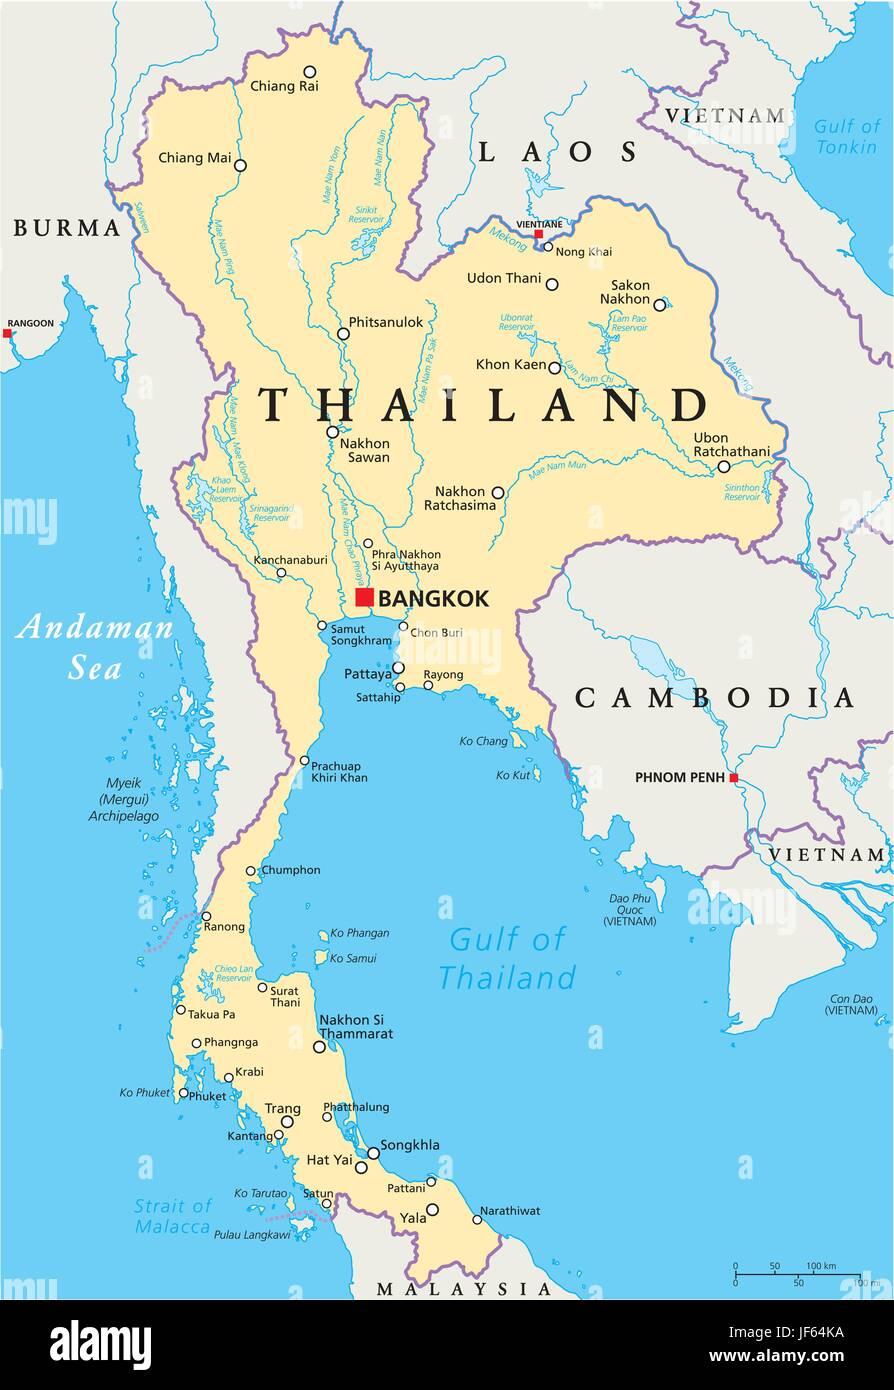 Thailand Bangkok Map Atlas Map Of The World Travel Asia - Thailand map